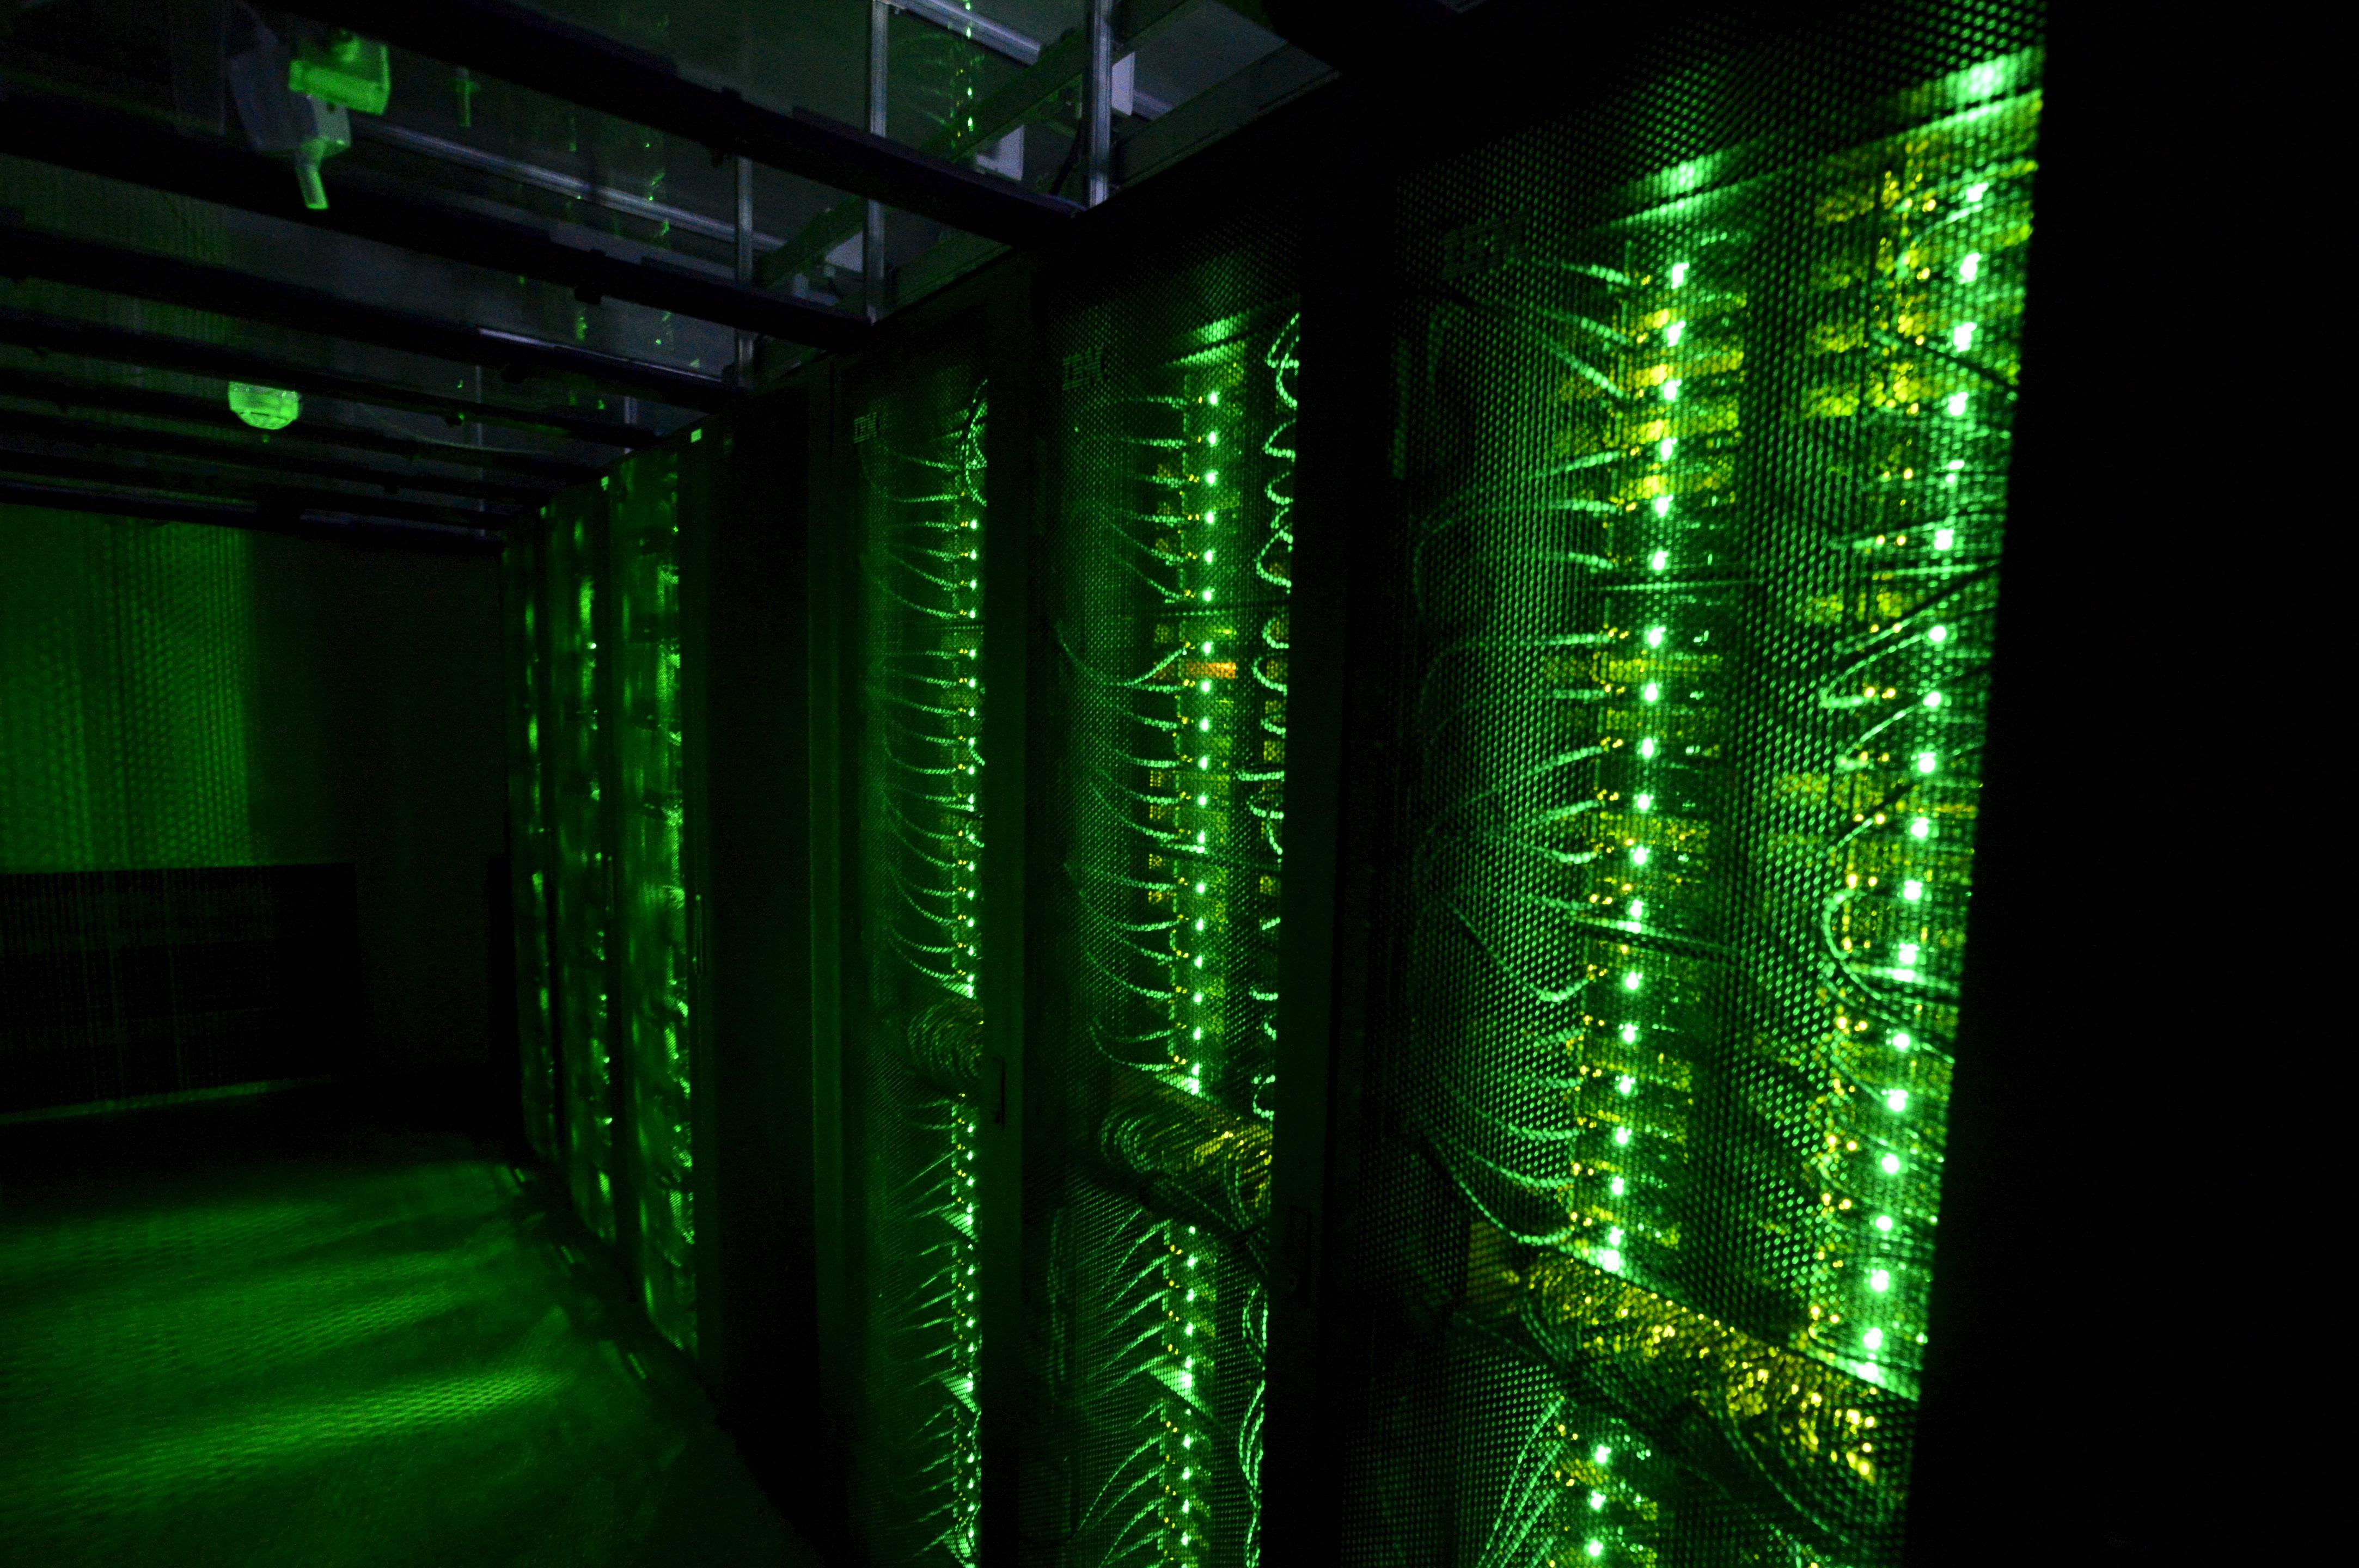 Servers for data storage are seen at Advania's Thor Data Center in Hafnarfjordur, Iceland